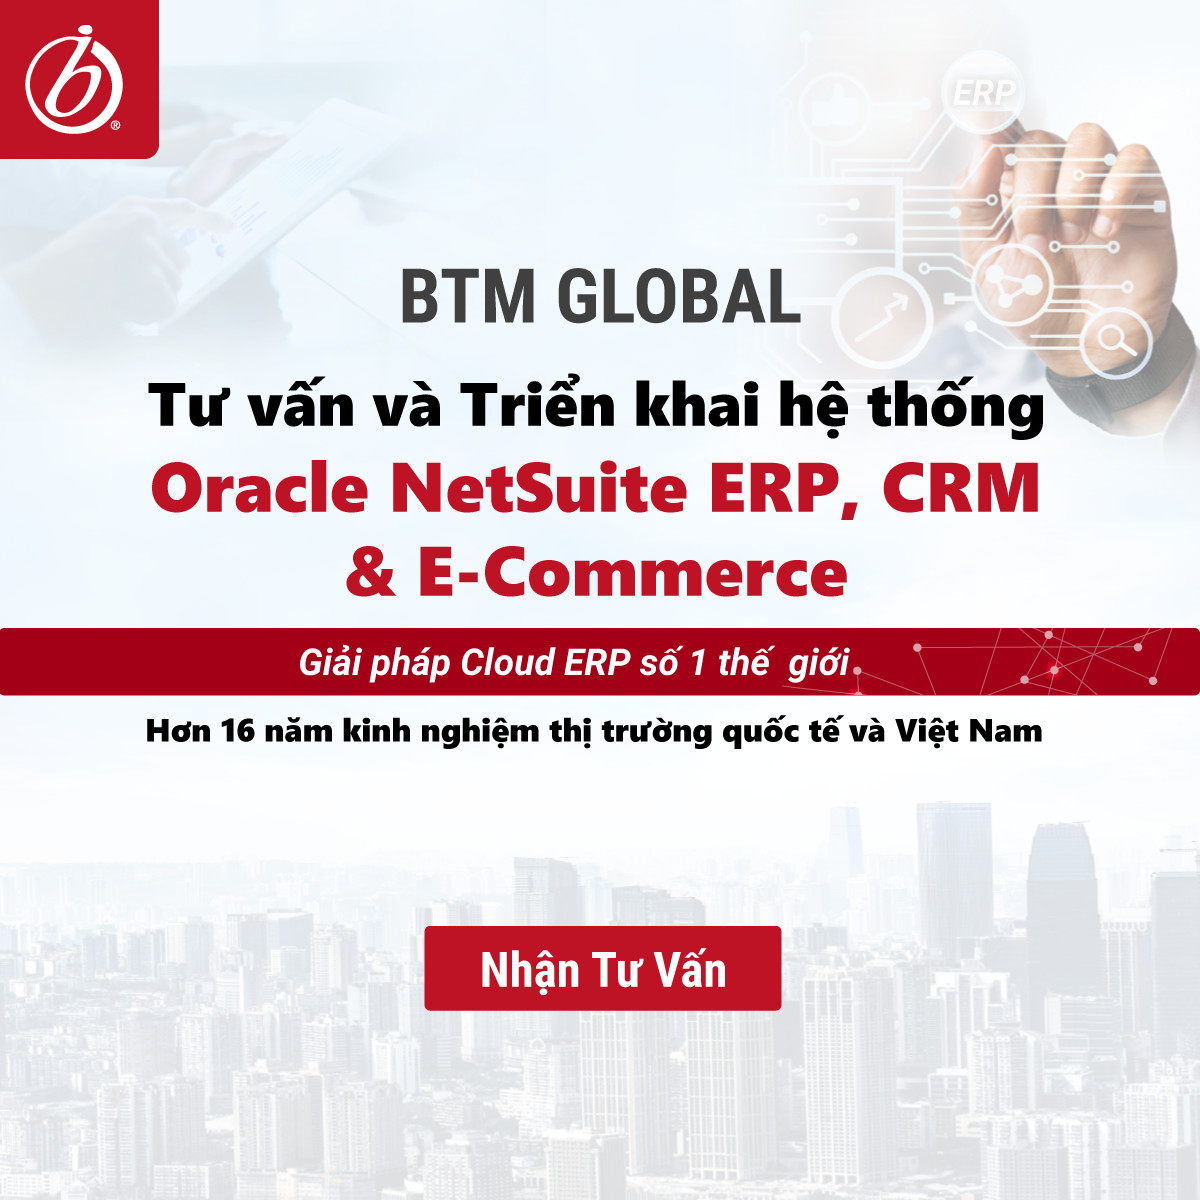 cty-bmt-global-vpdd